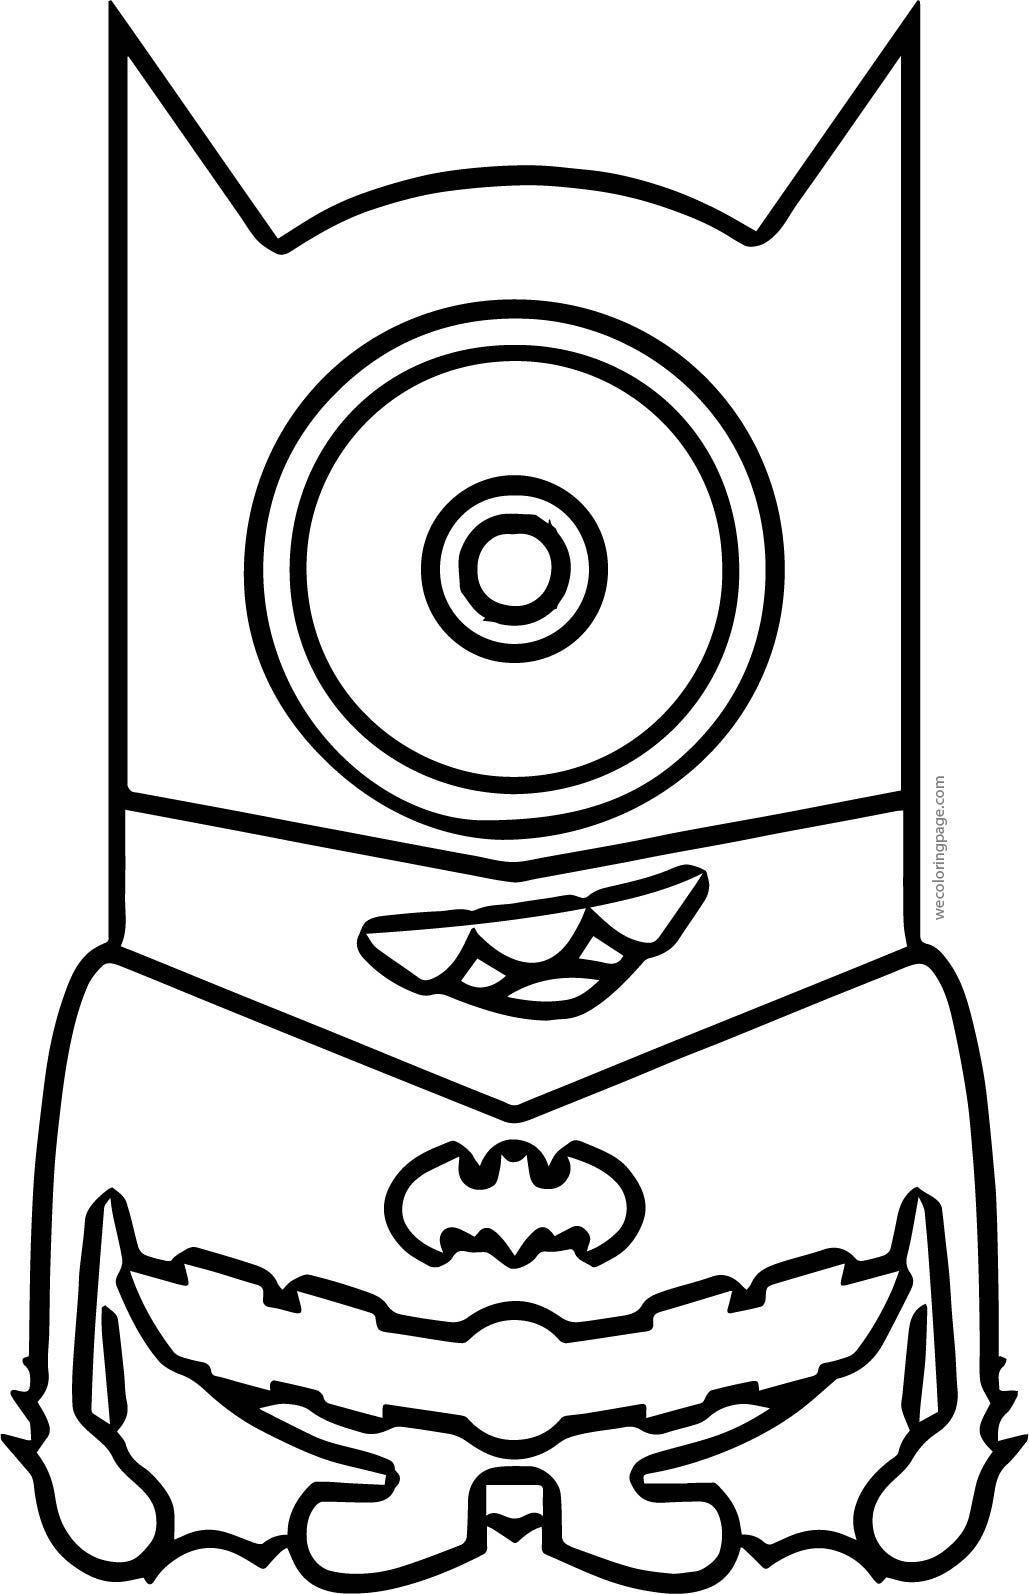 Funny Batman Minion Coloring Page Wecoloringpage Com Minion